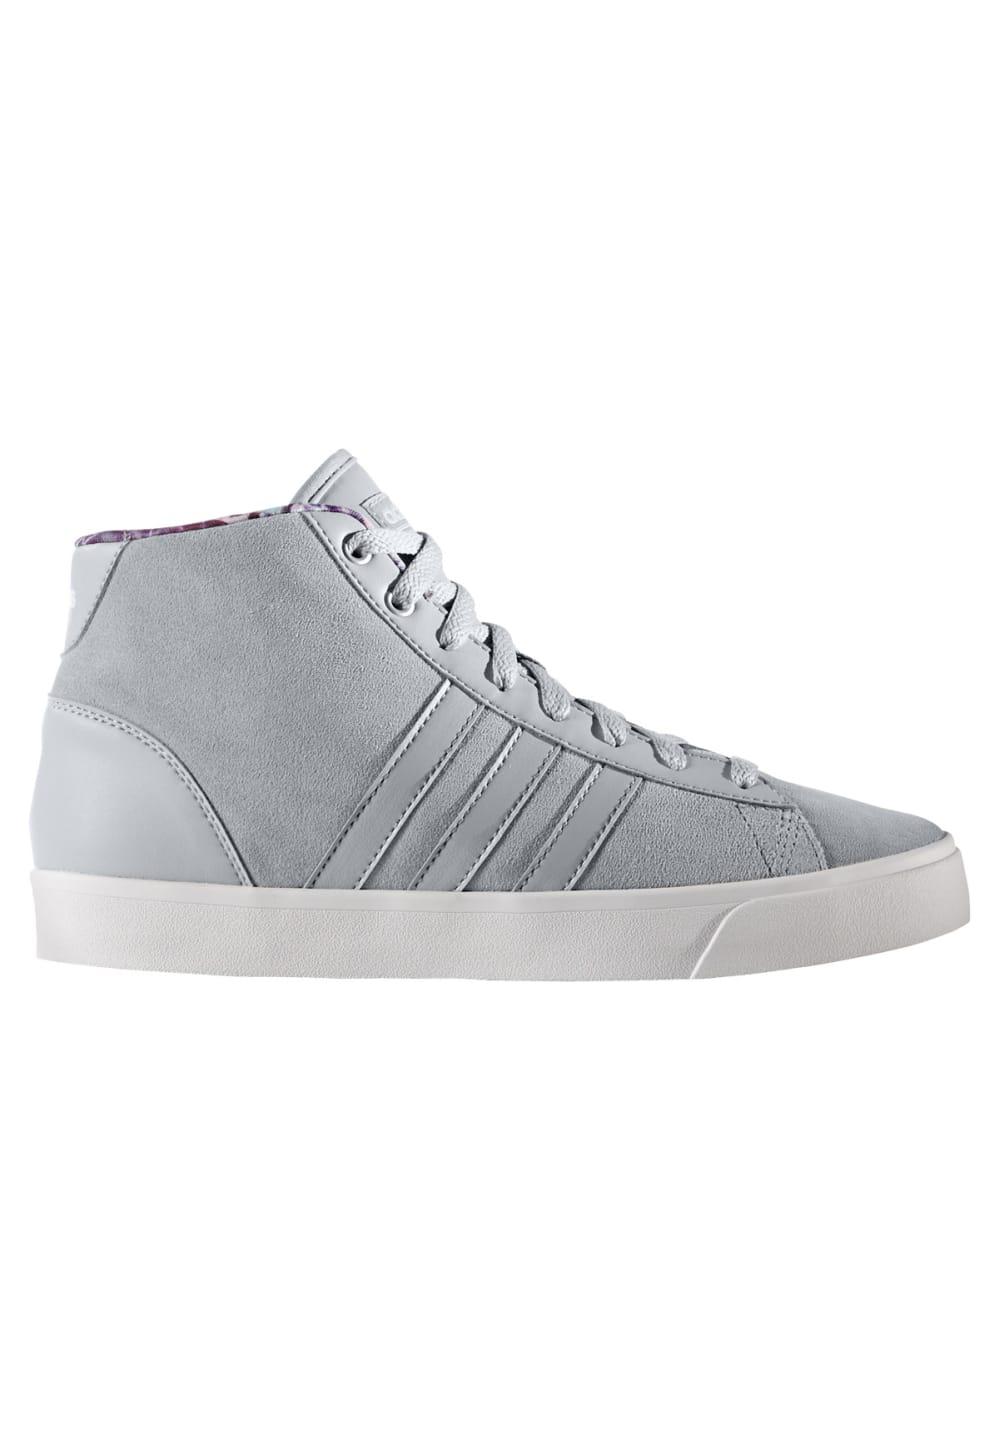 Cheap Adidas Neo Cloudfoam Daily QT Mid Womens Shoes Grey